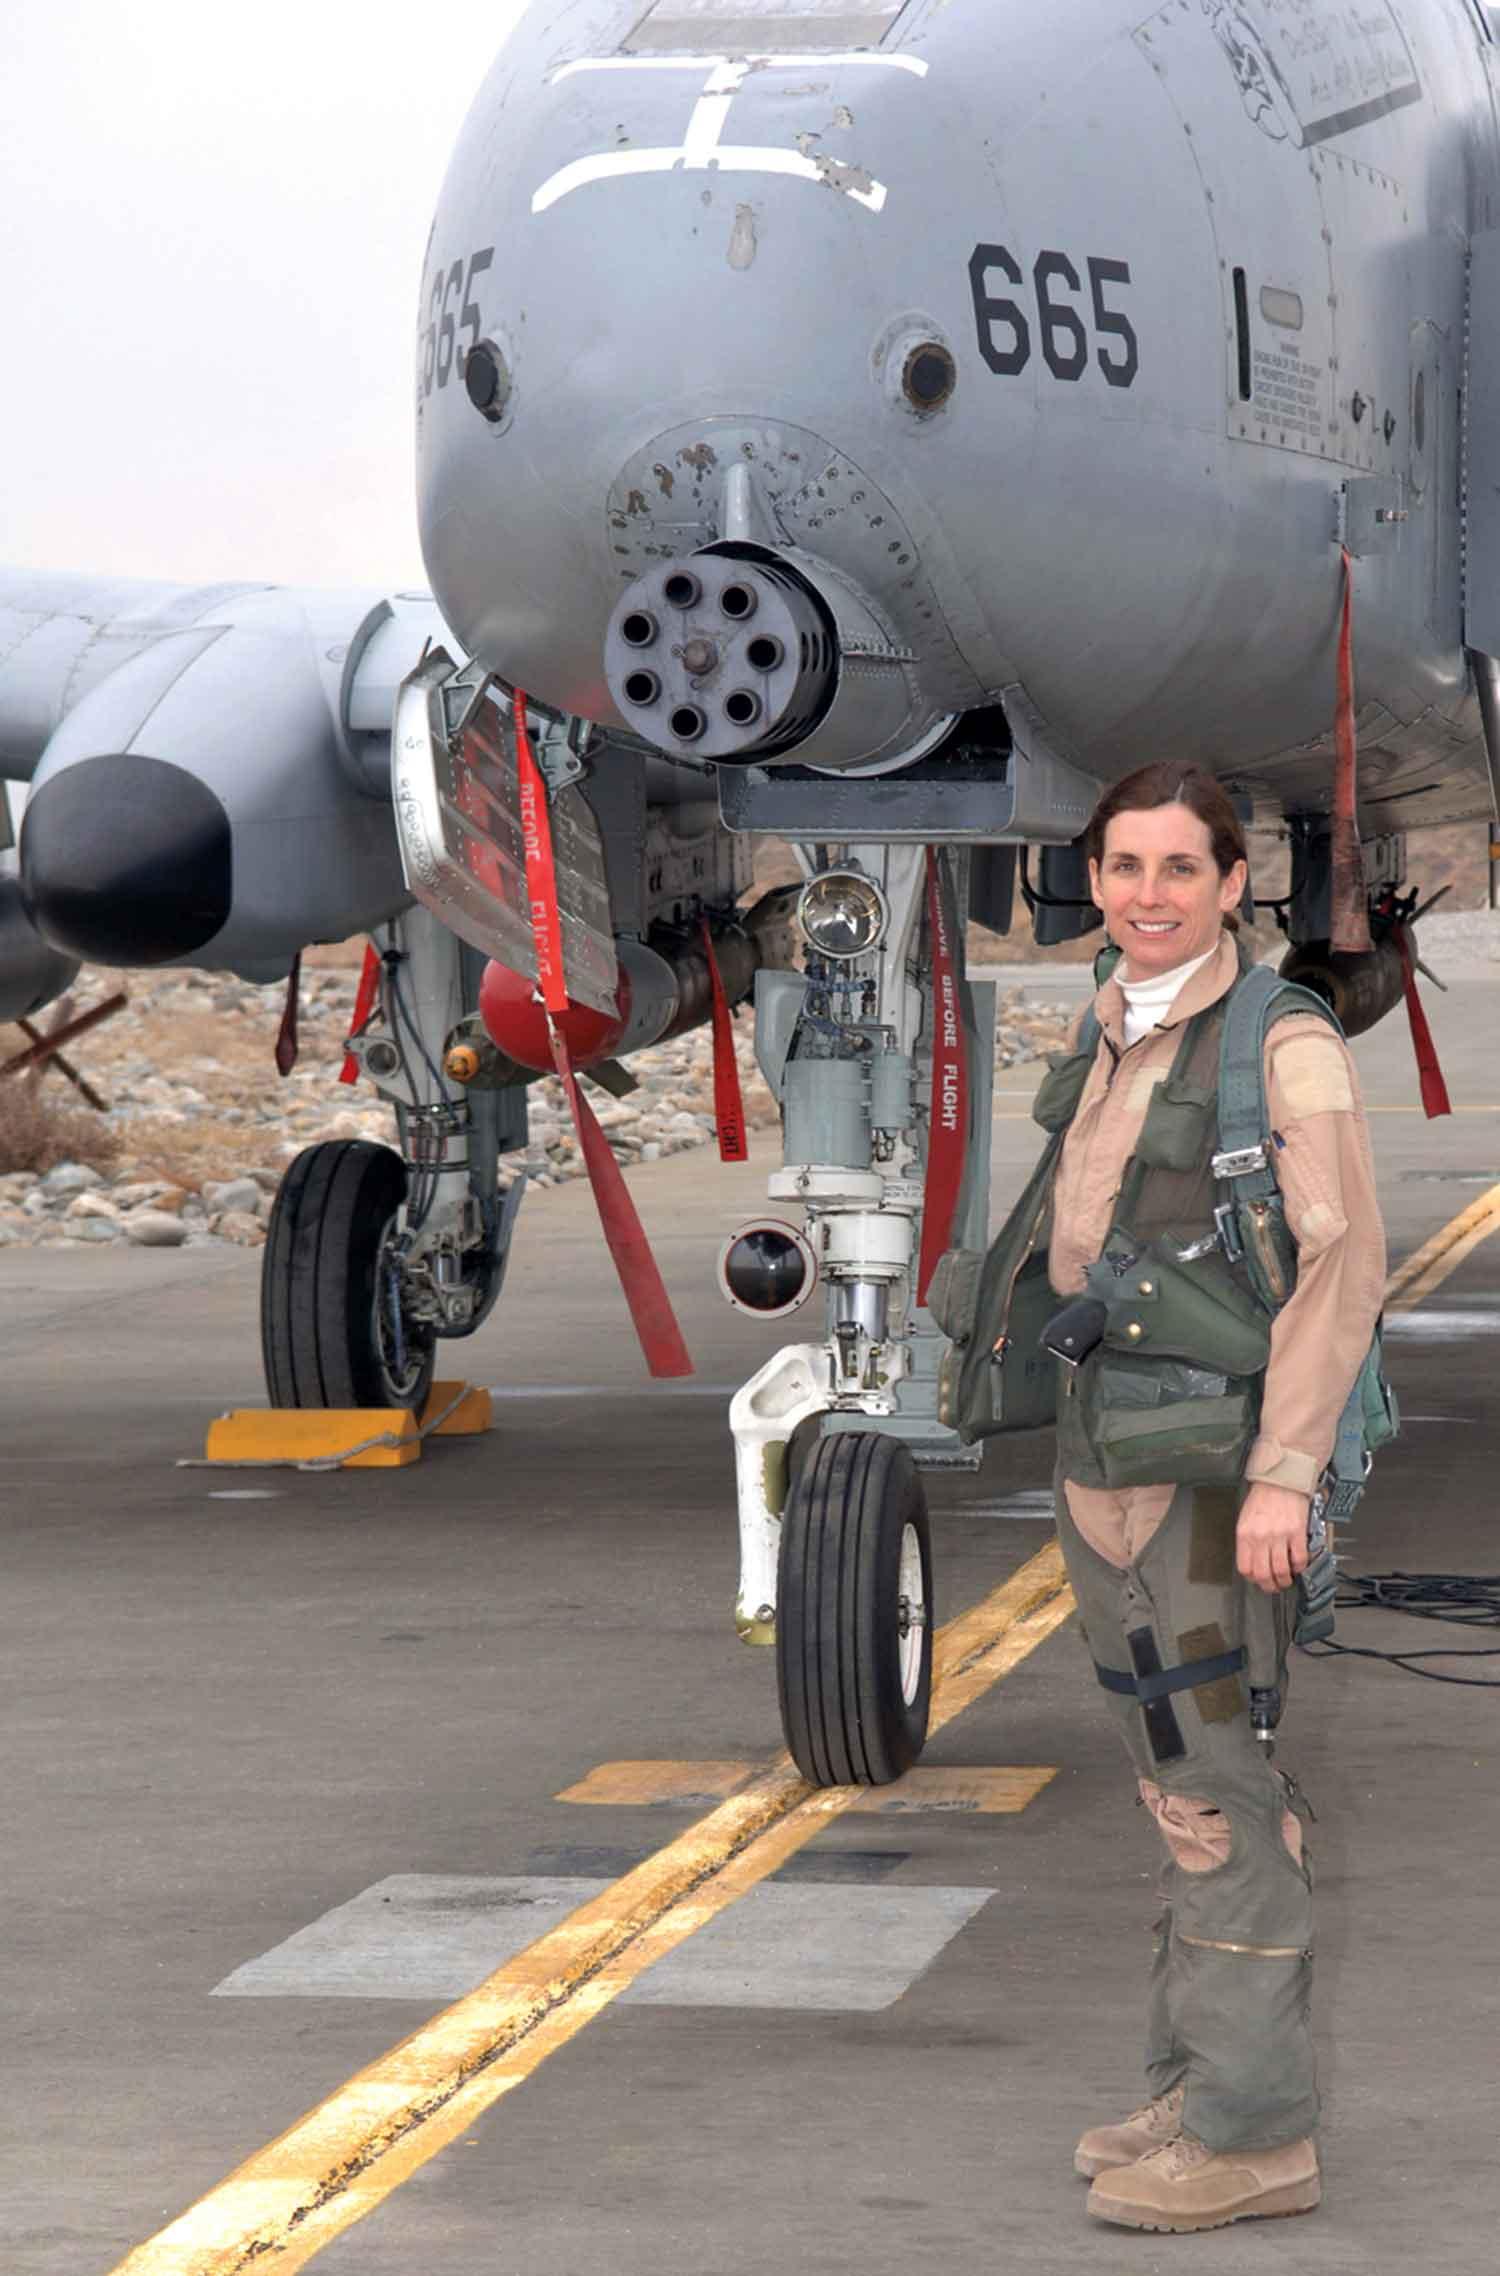 McSally with her A-10 Thunderbolt II aircraft; Photo Courtesy U.S. Air Force